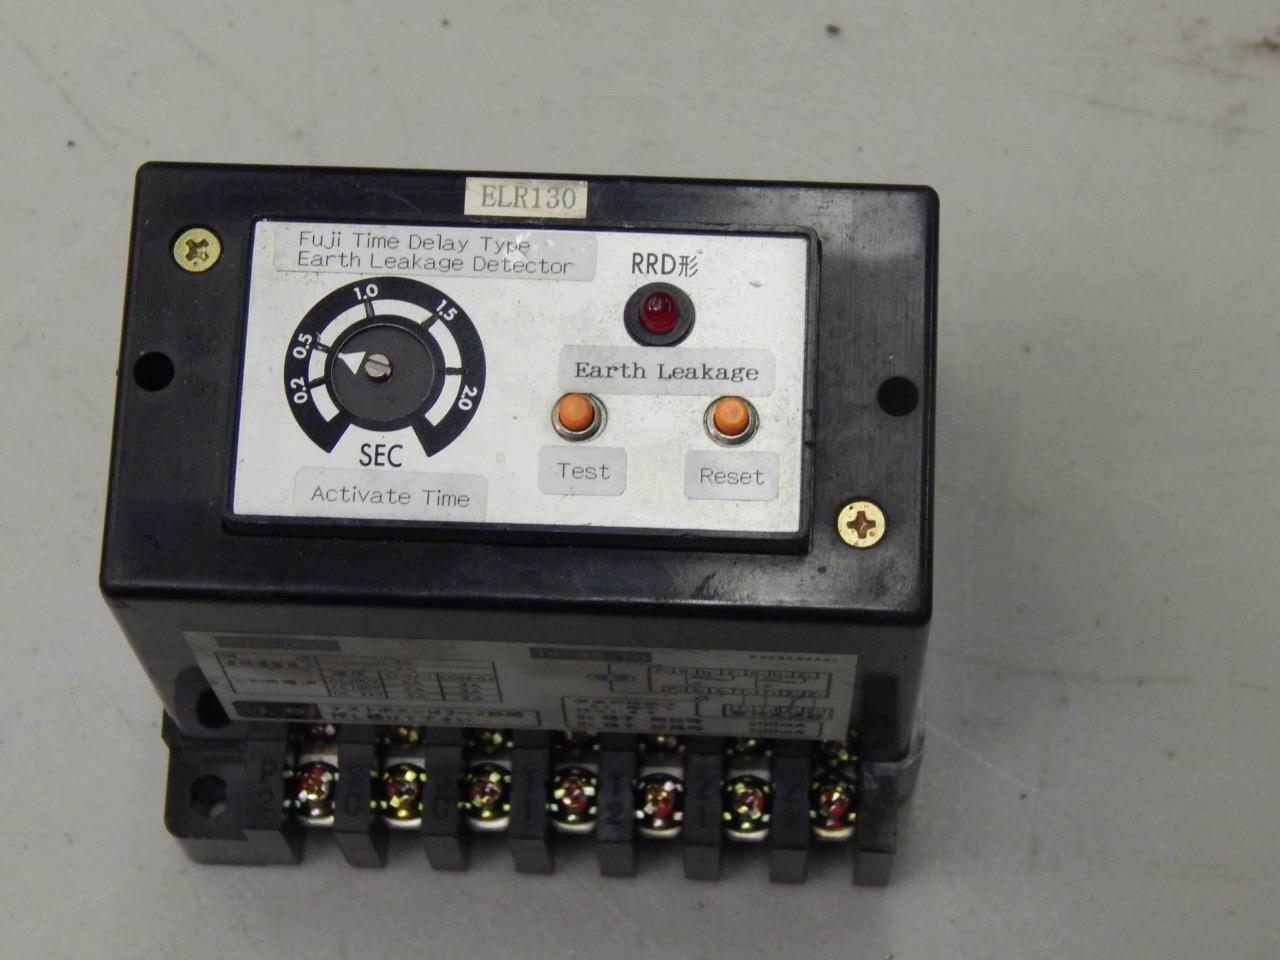 #780 Fuji Electric RRD-6A Z3 Time Delay Type Earth Leakage Detector  2-2 Sec